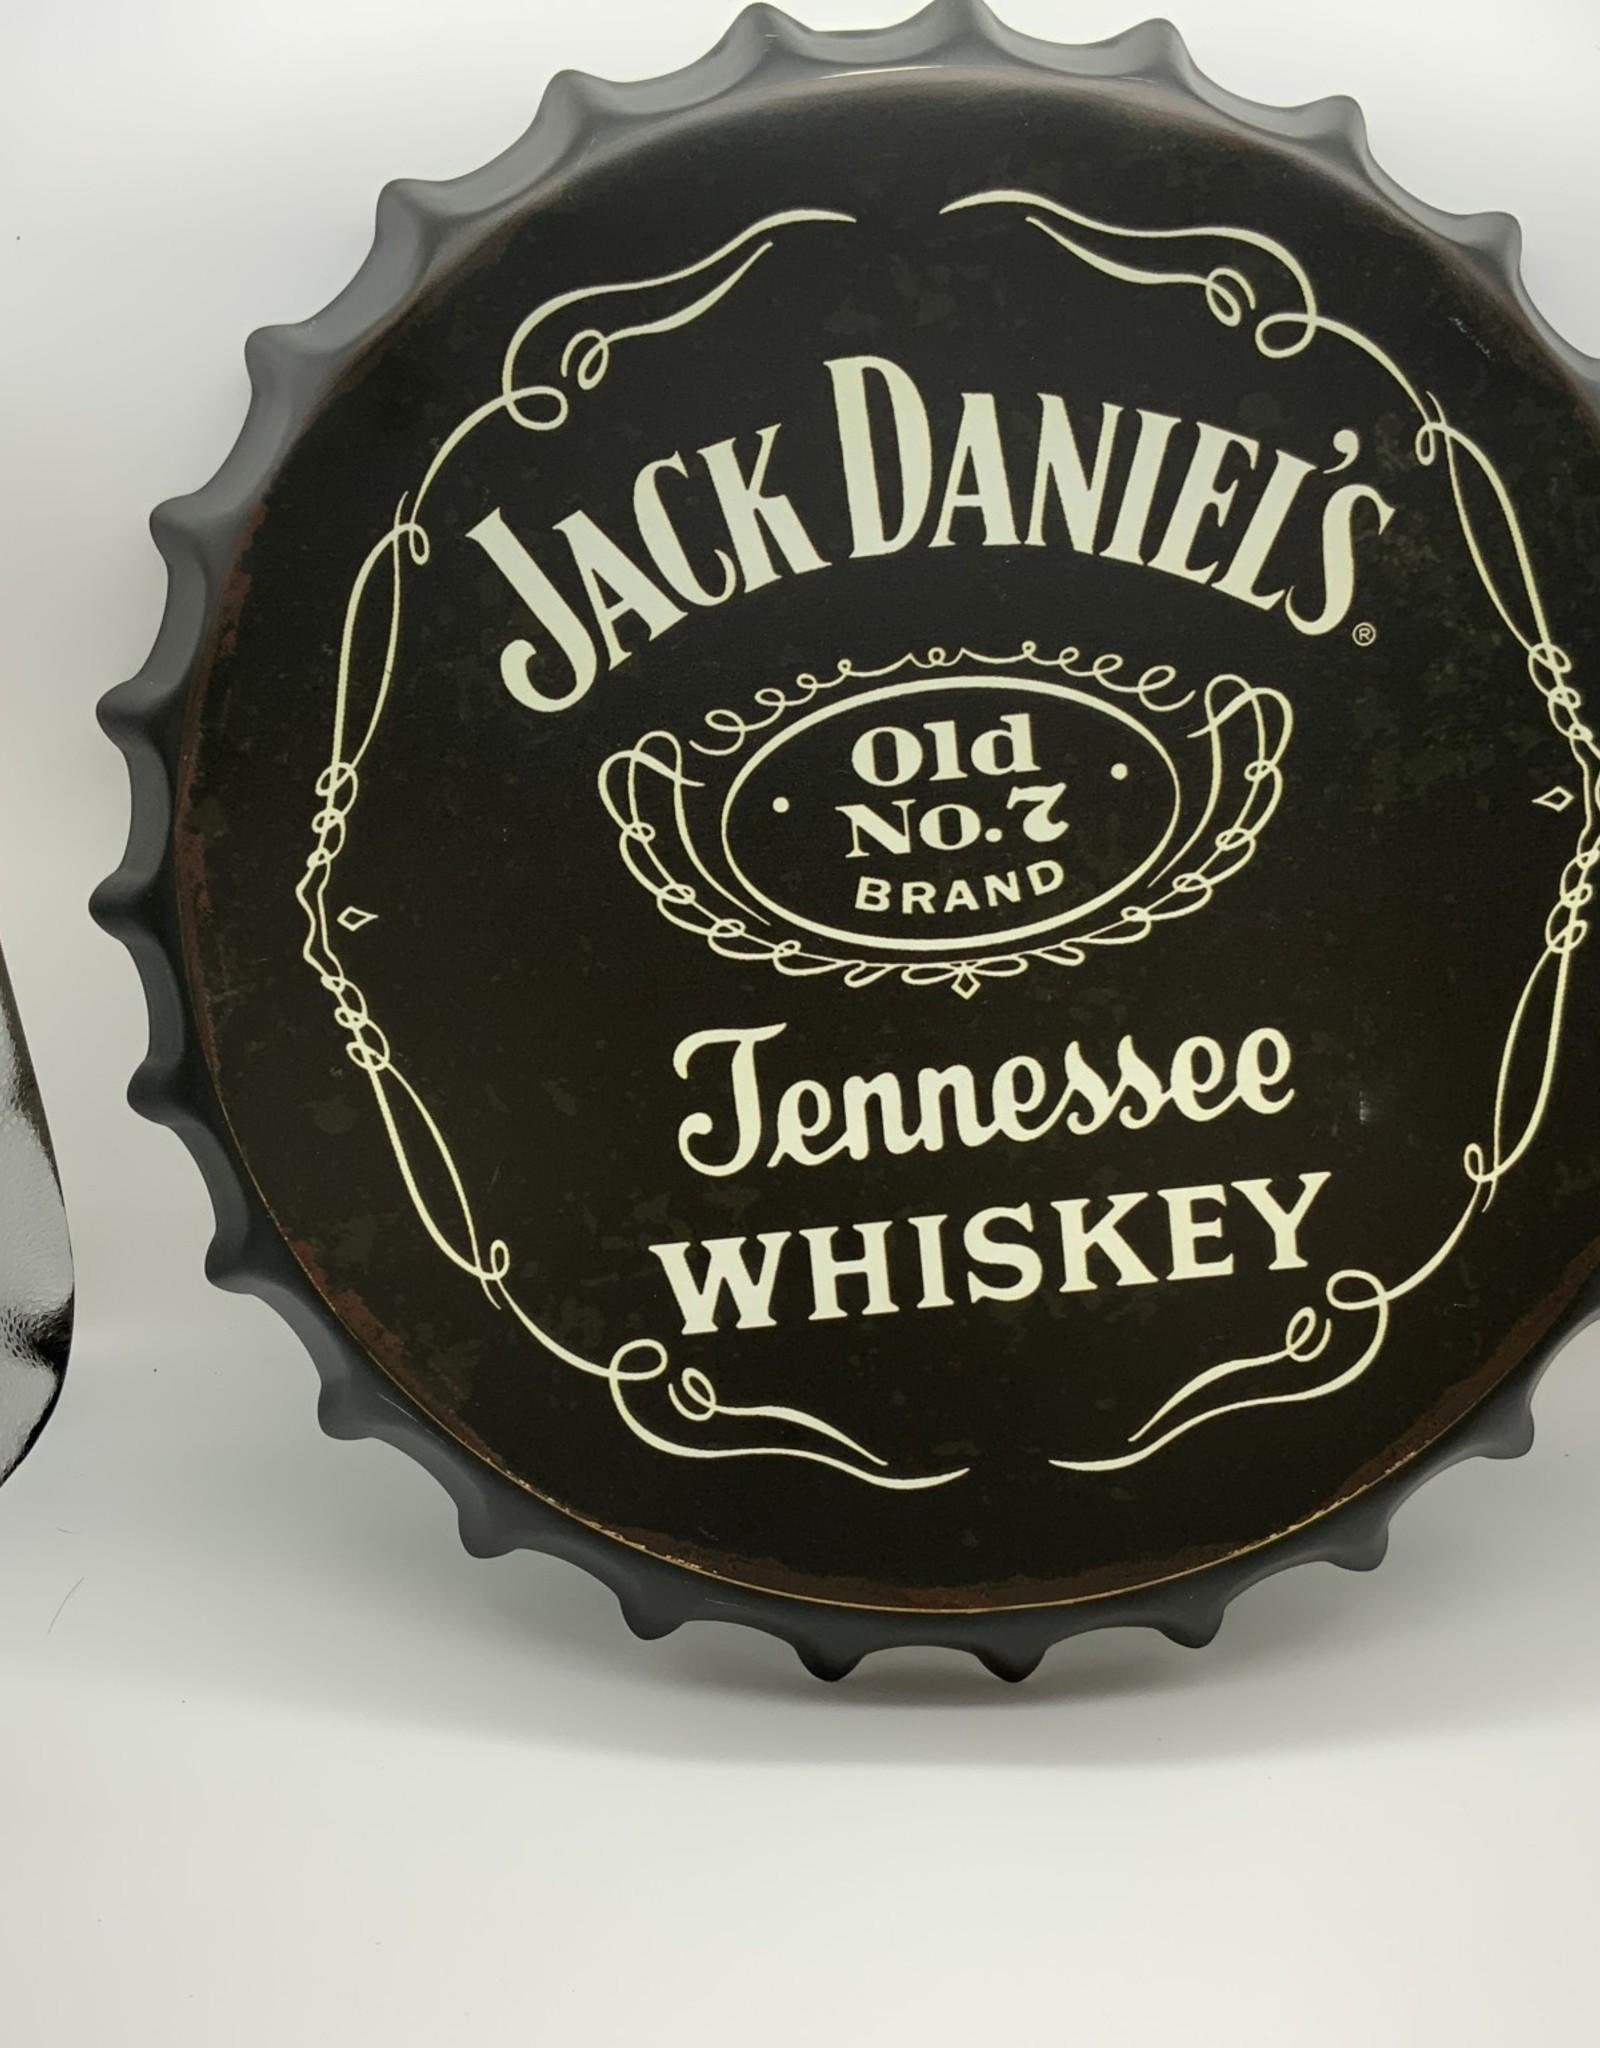 Jack Daniels's Bottle Cap LG